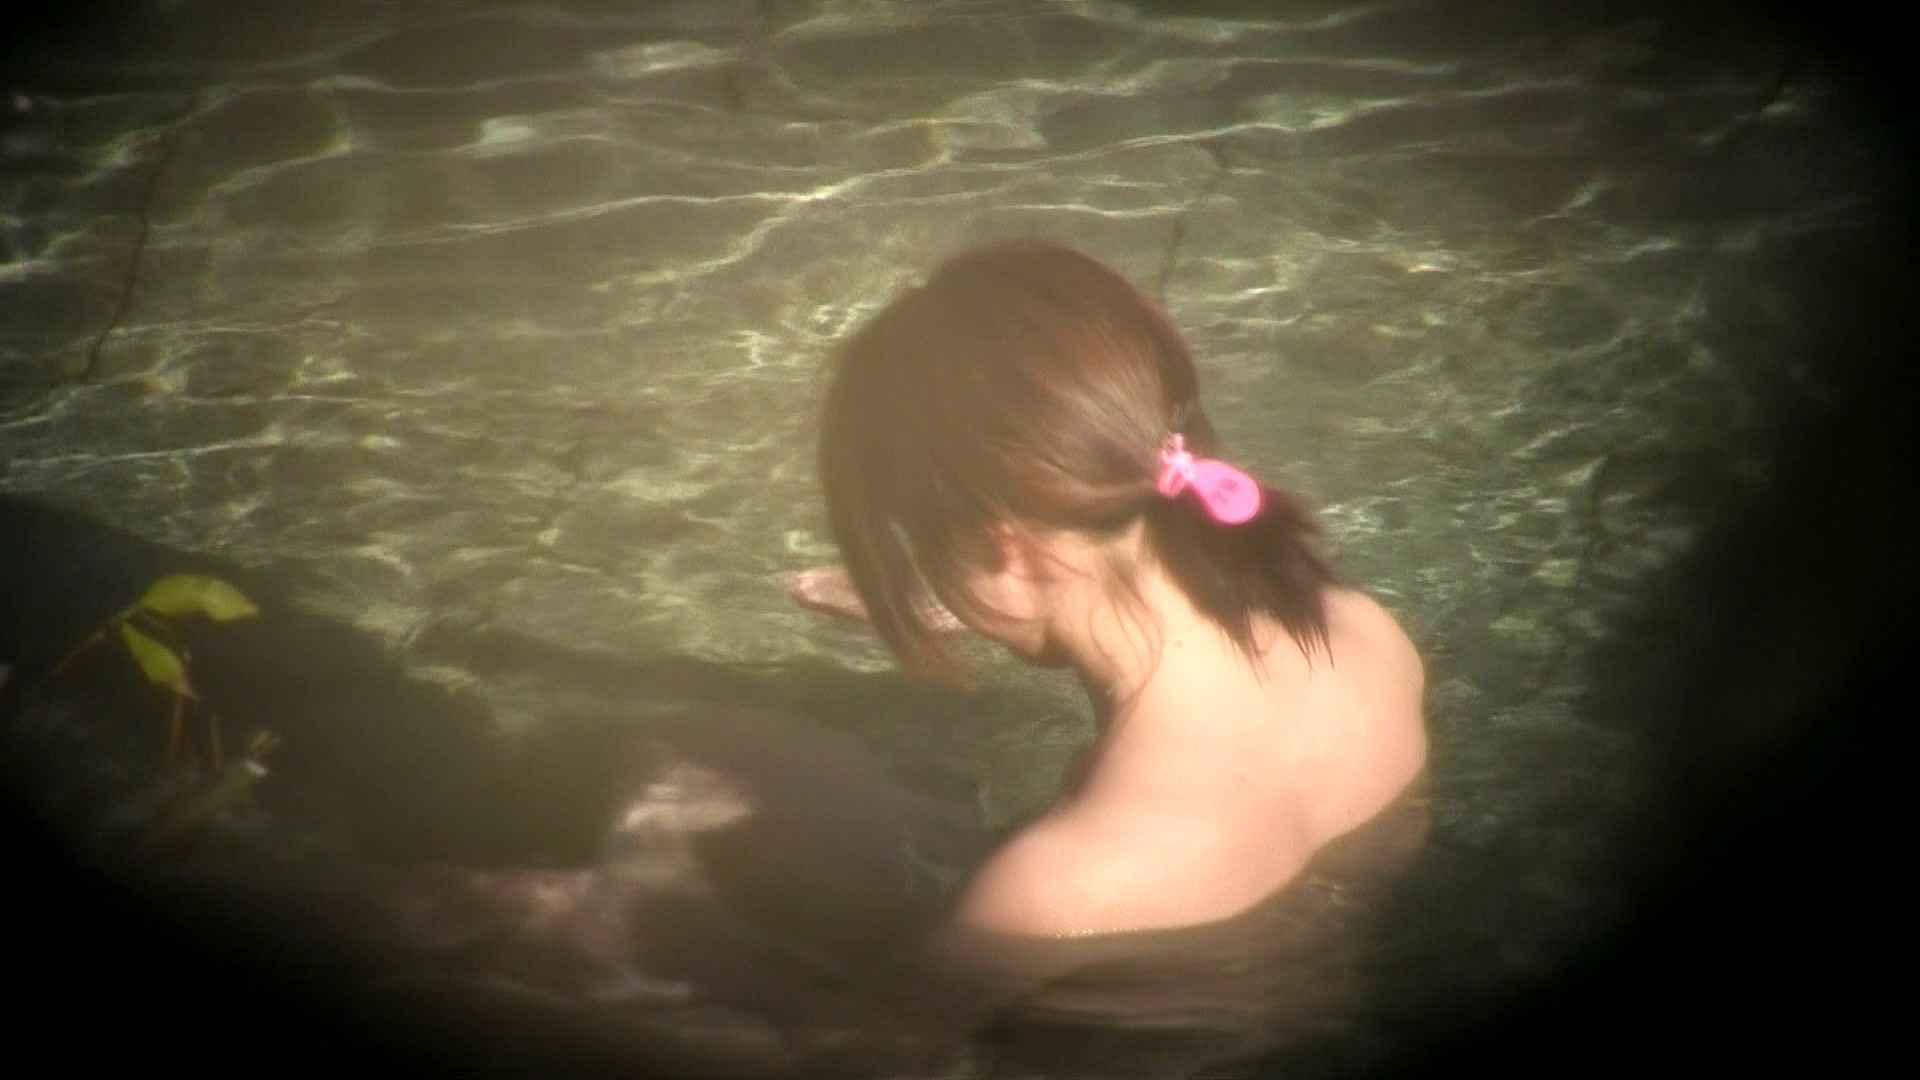 Aquaな露天風呂Vol.698 美しいOLの裸体 われめAV動画紹介 104pic 50